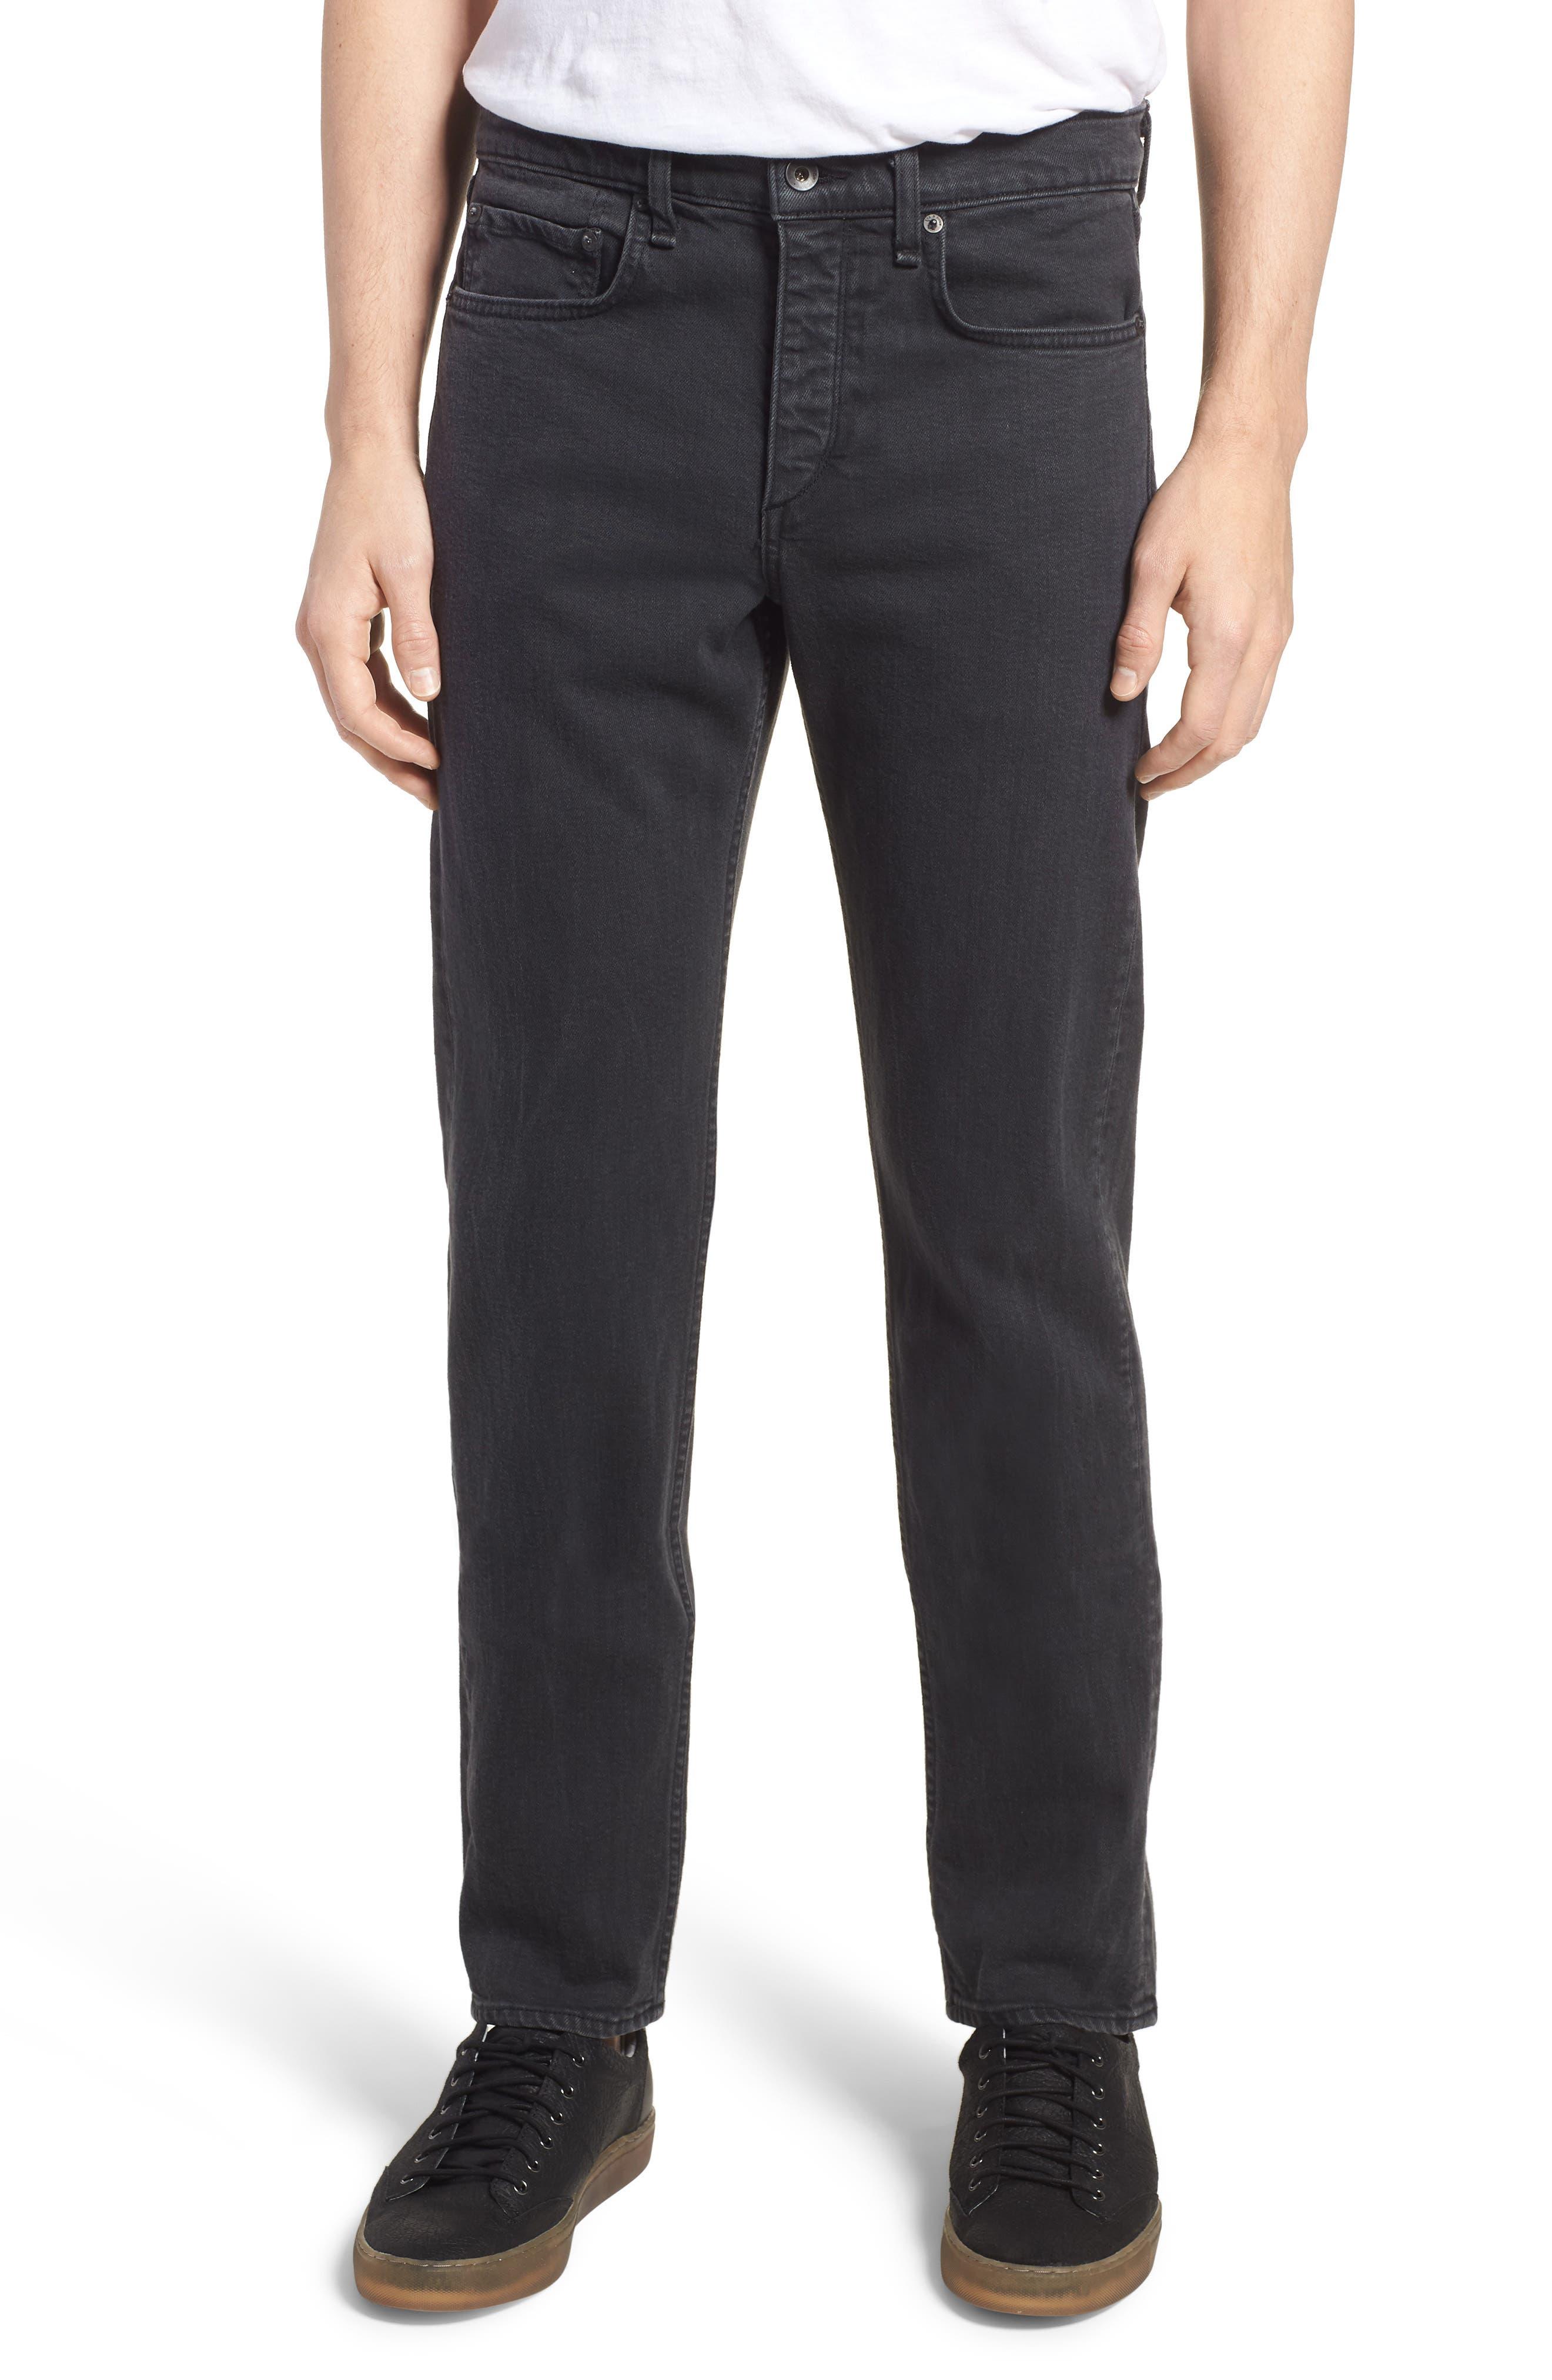 Fit 2 Slim Fit Jeans,                         Main,                         color, SHELTER